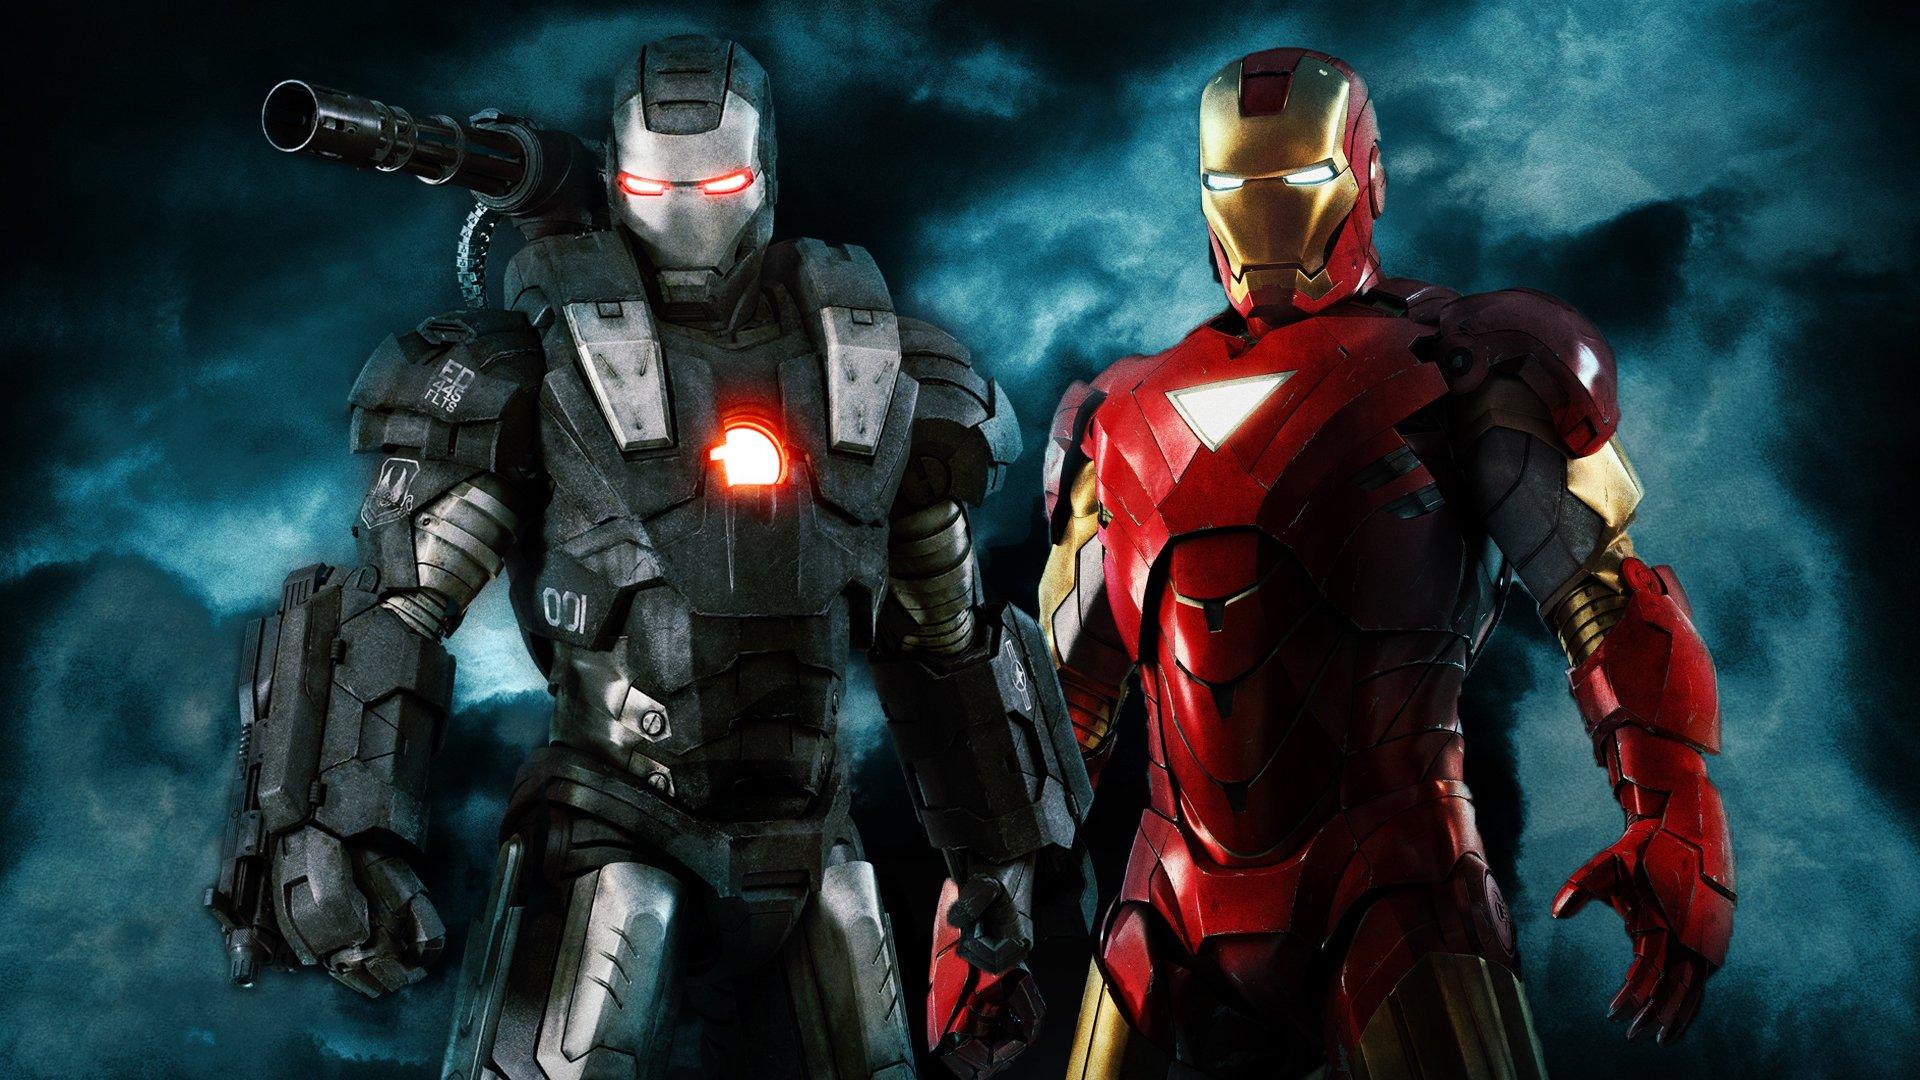 Imà Genes De Iron Man: Iron Man 2 Full HD Wallpaper And Background Image